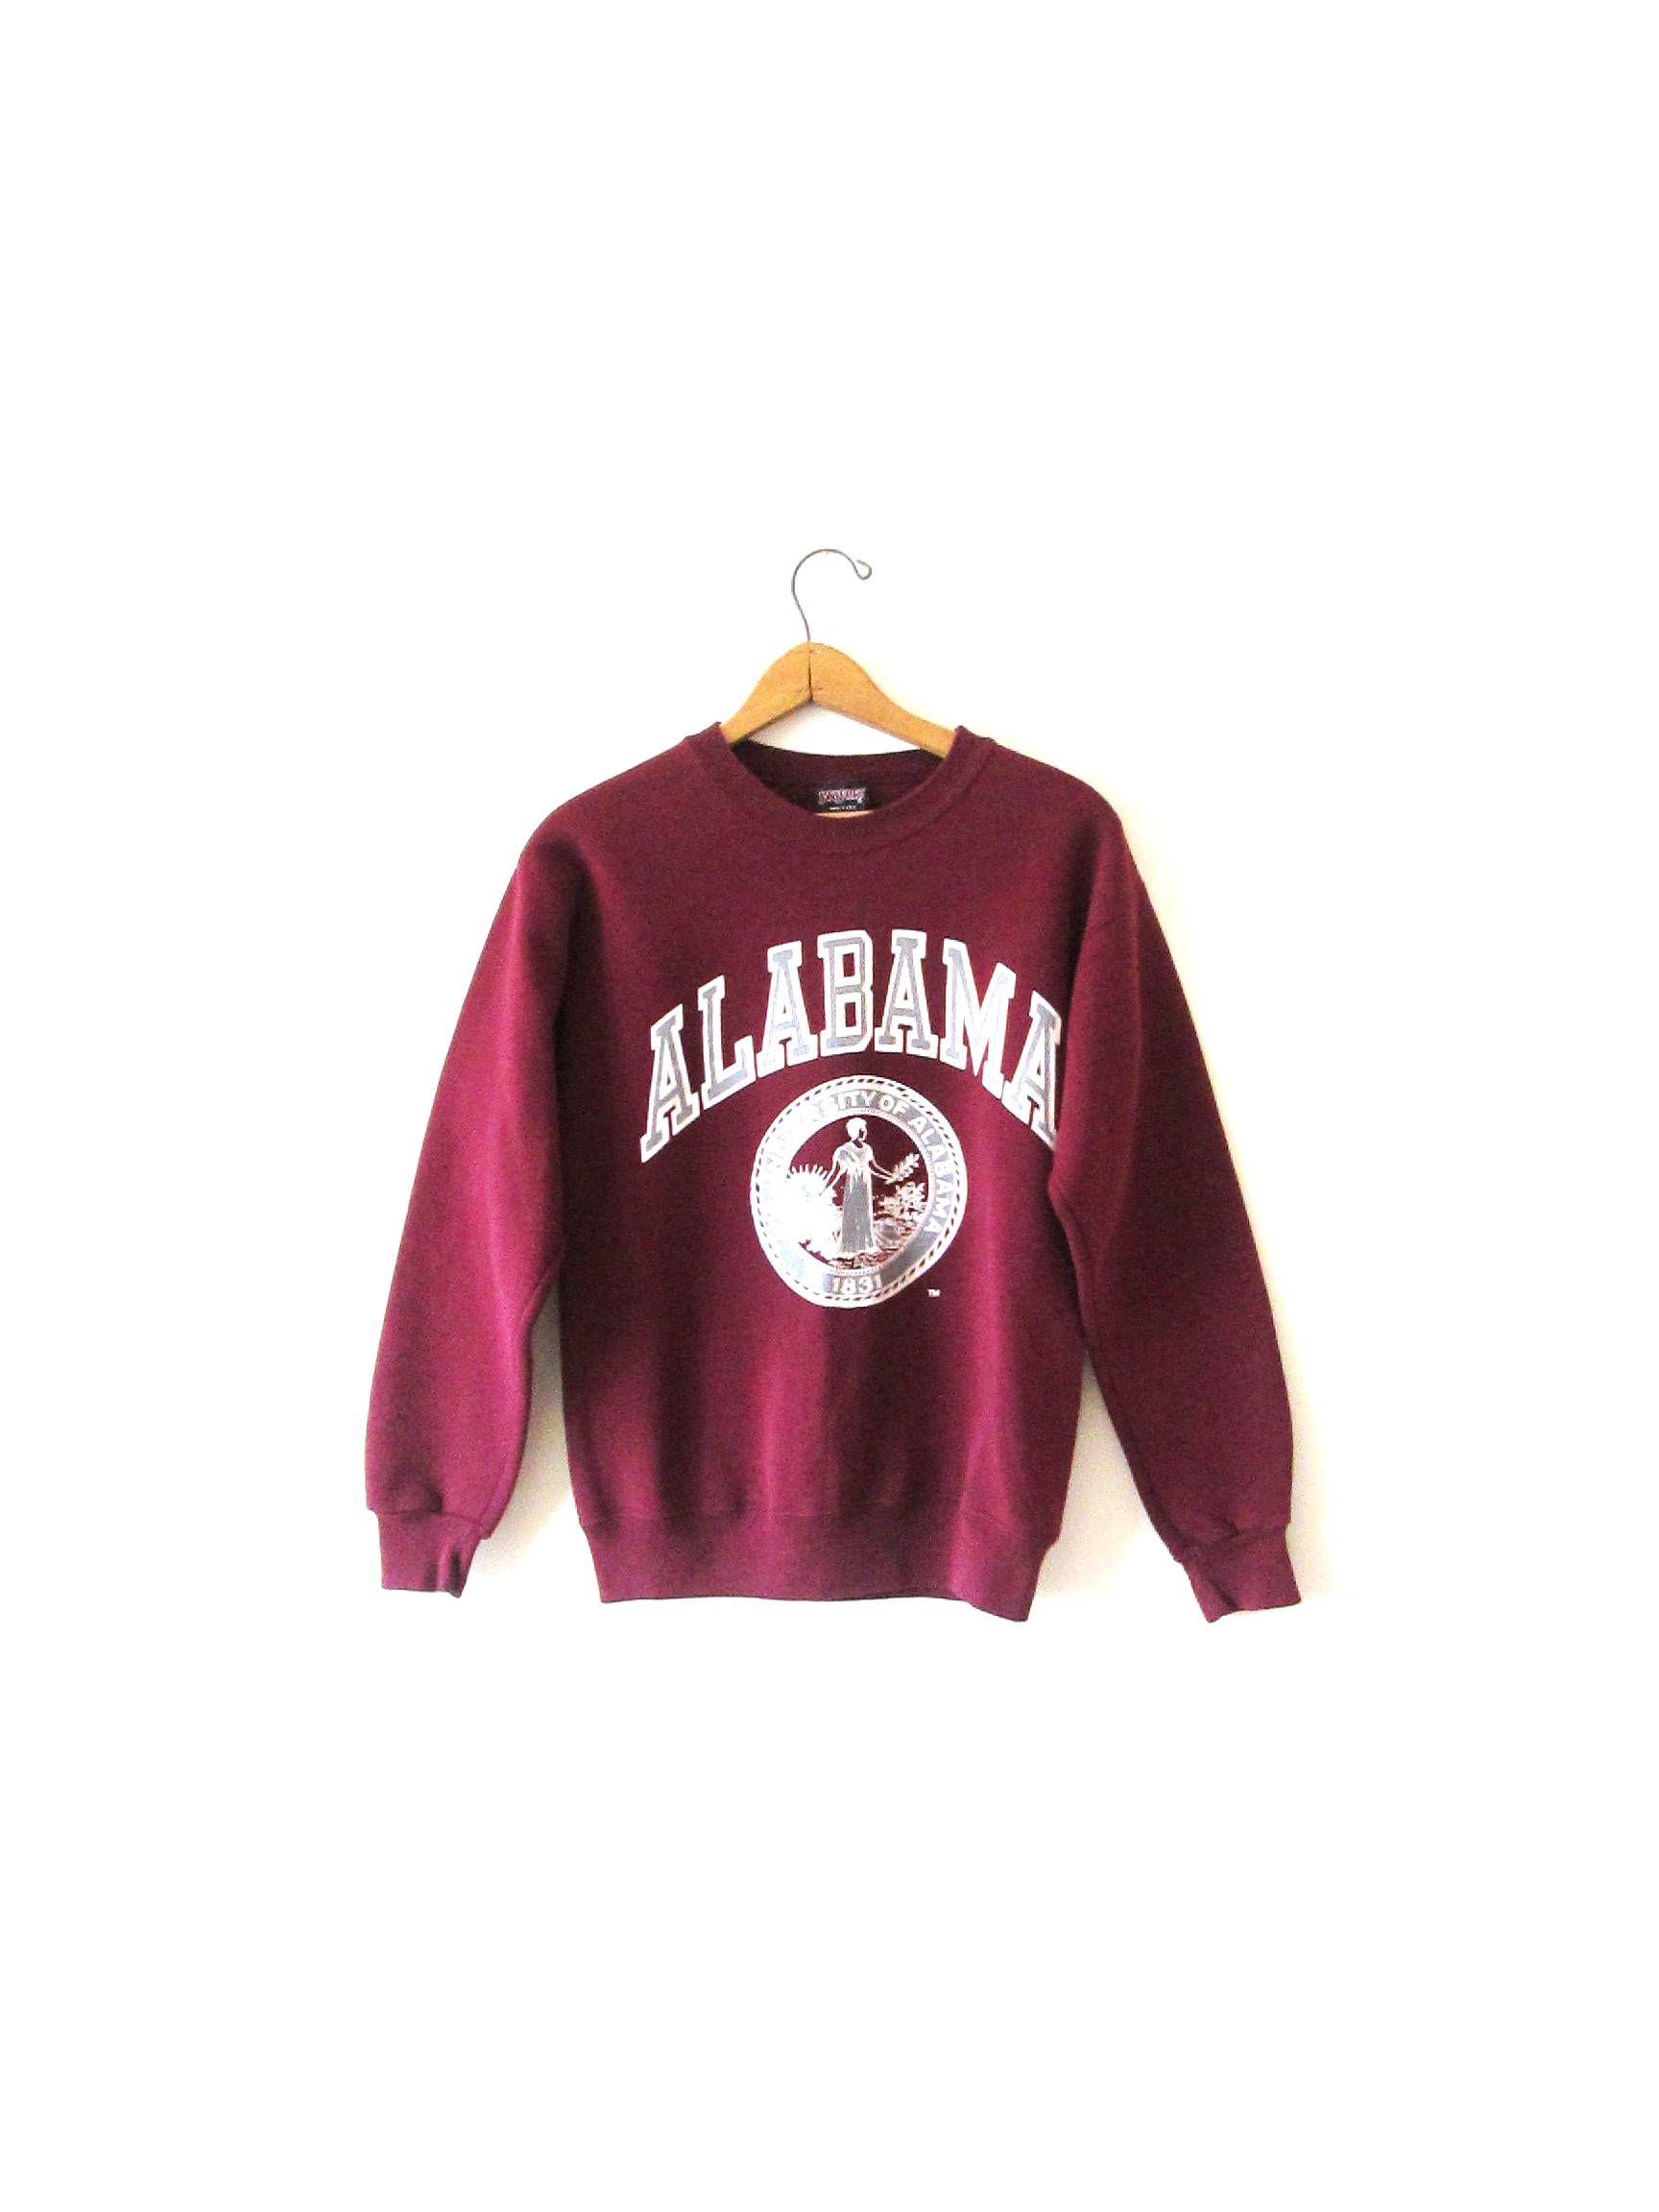 Vintage 1990s Alabama University Of Alabama Jansport Crimson Tide Roll Tide Sweatshirt Sz S Alabama Clothes Alabama Sweatshirt Football Outfits [ 2304 x 1728 Pixel ]